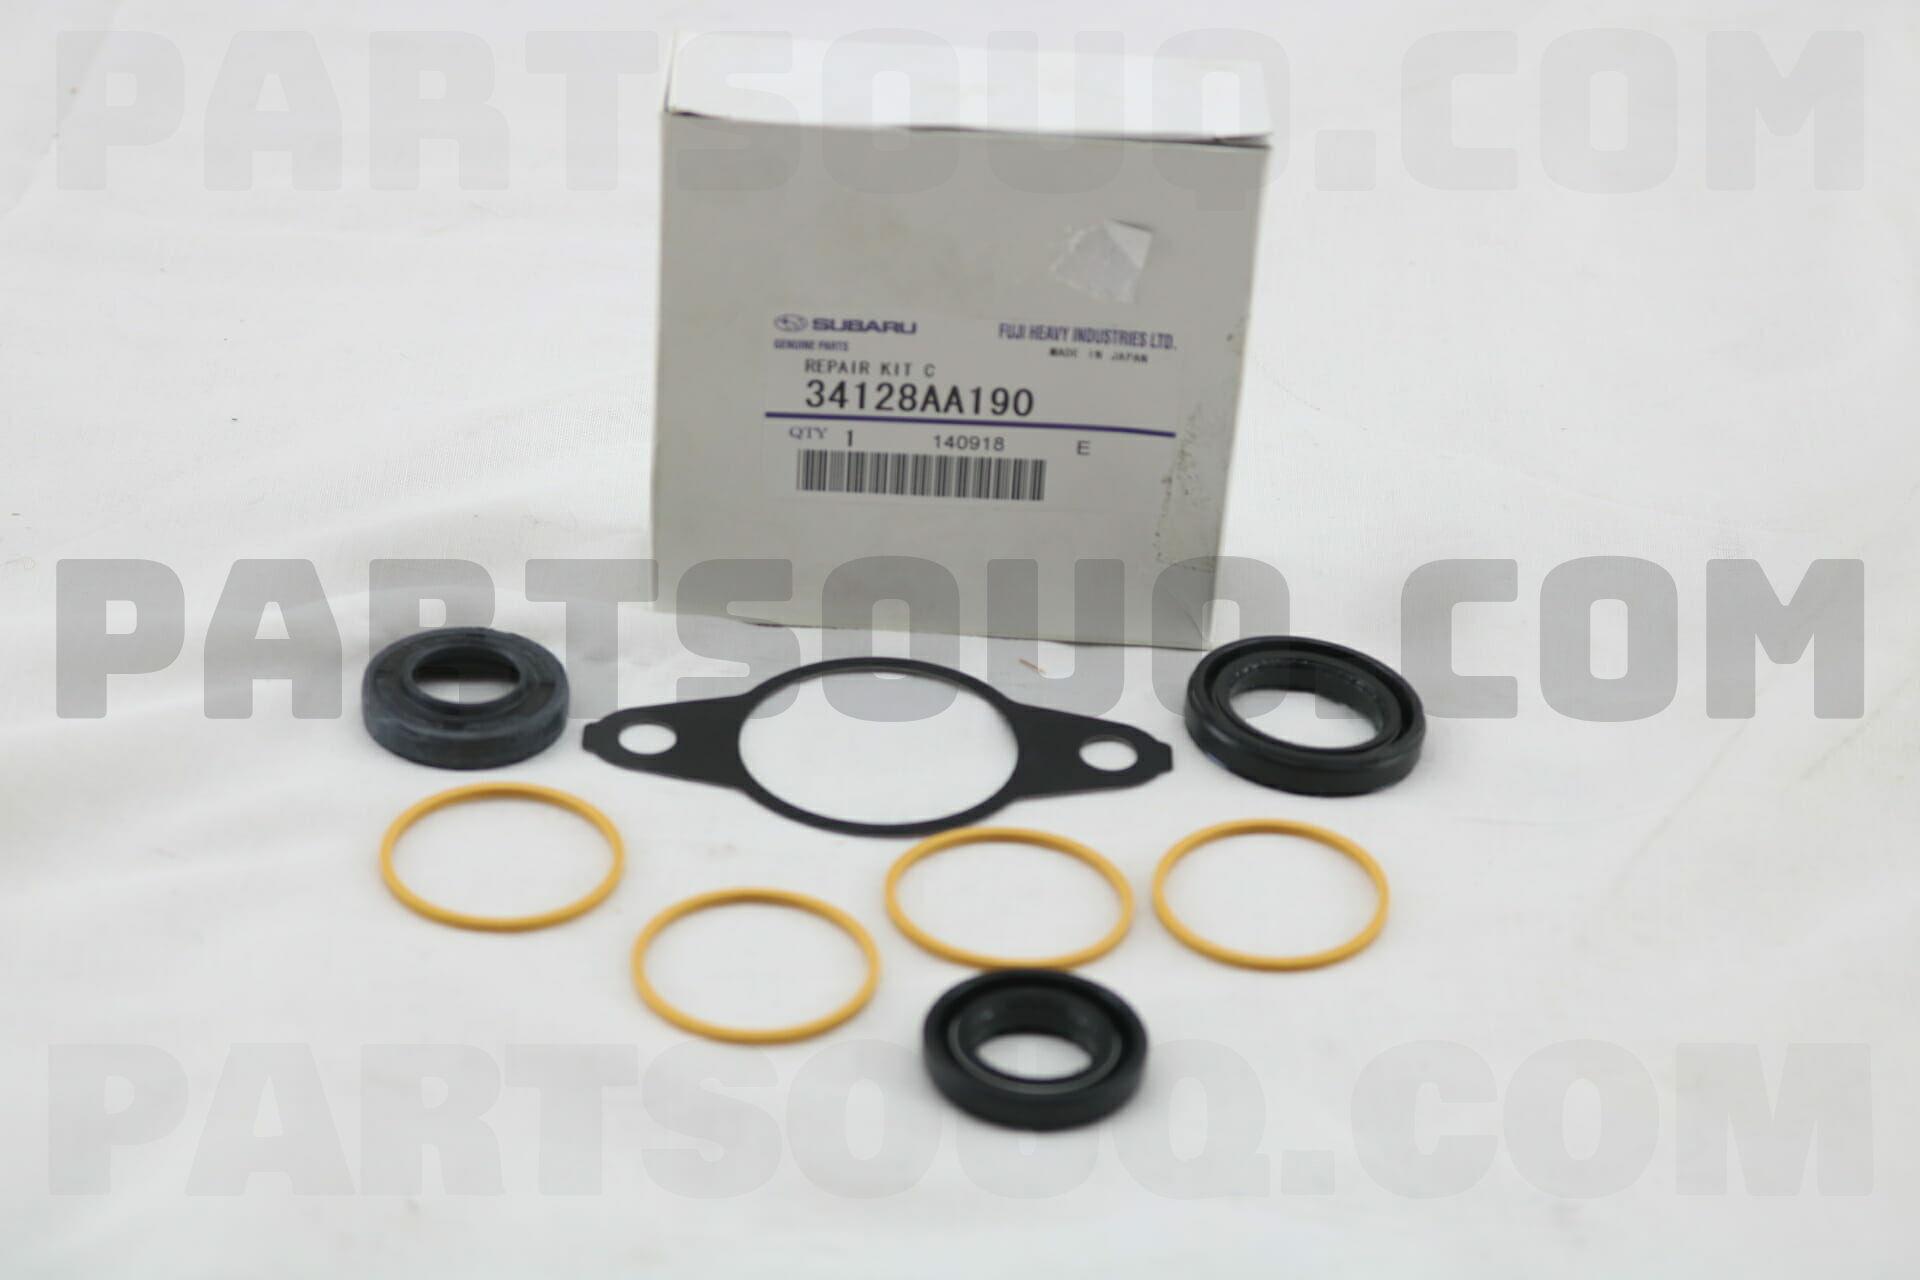 34128AA190 Subaru REPAIR KIT C Price: 20 25$, Weight: 0 043kg